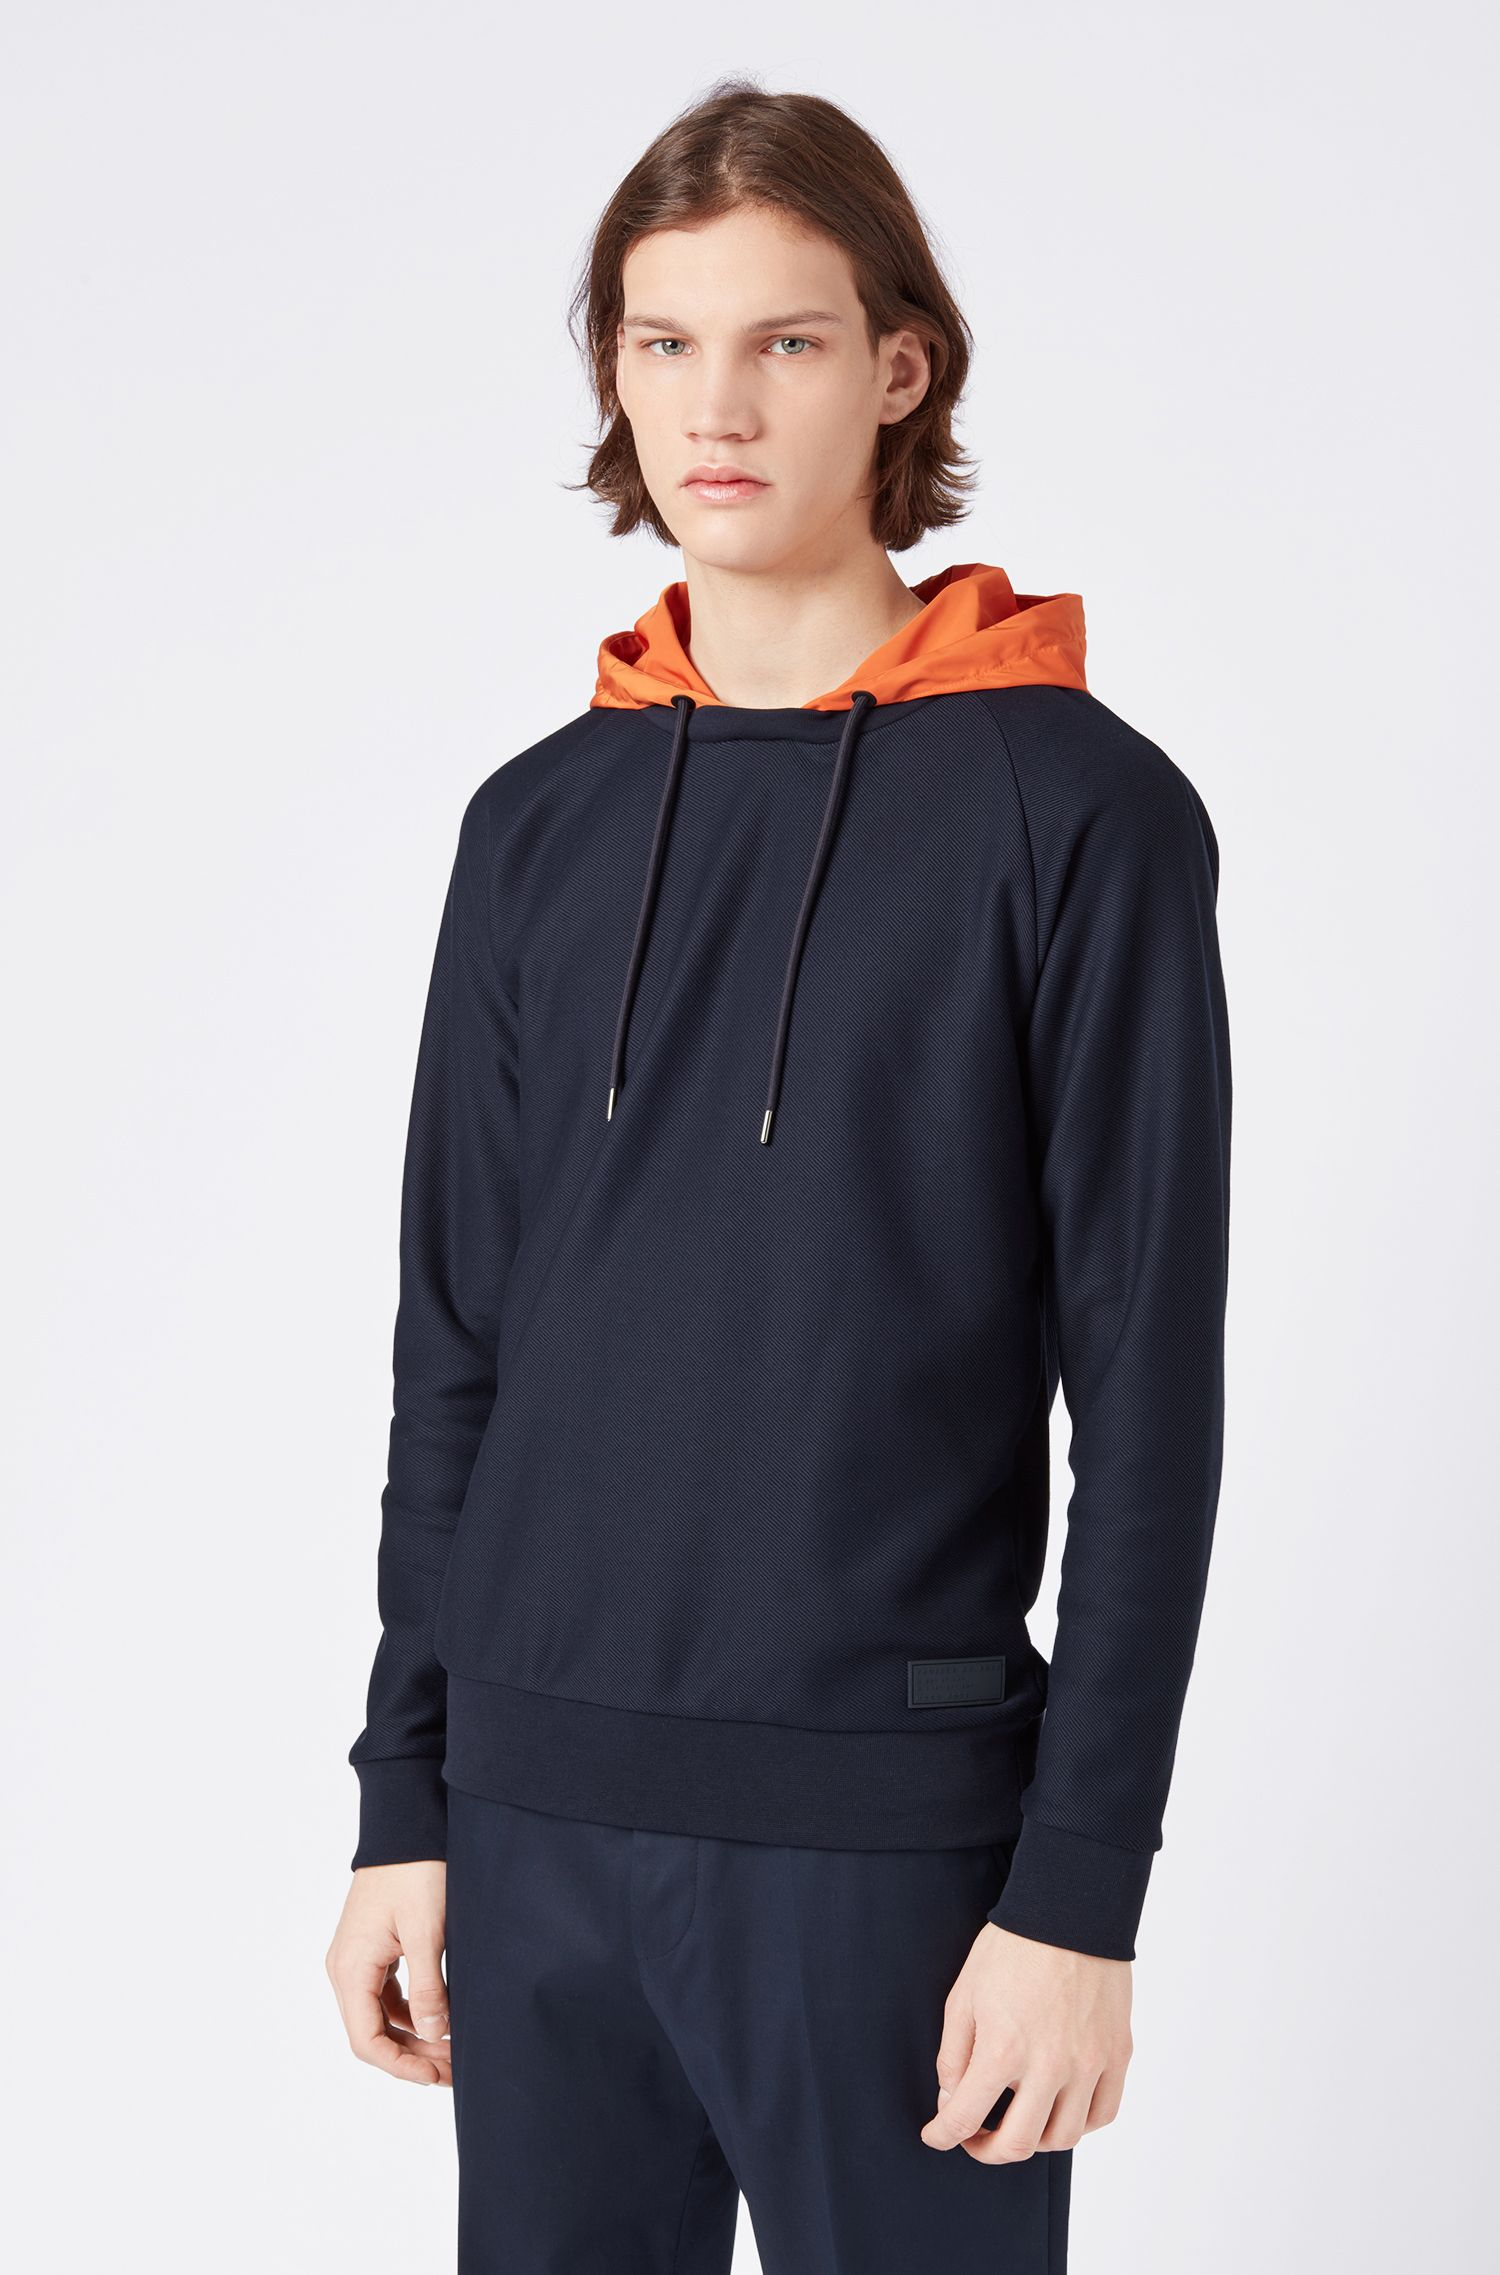 Hybrid-Sweatshirt mit abnehmbarer Kapuze in Kontrastfarbe, Dunkelblau